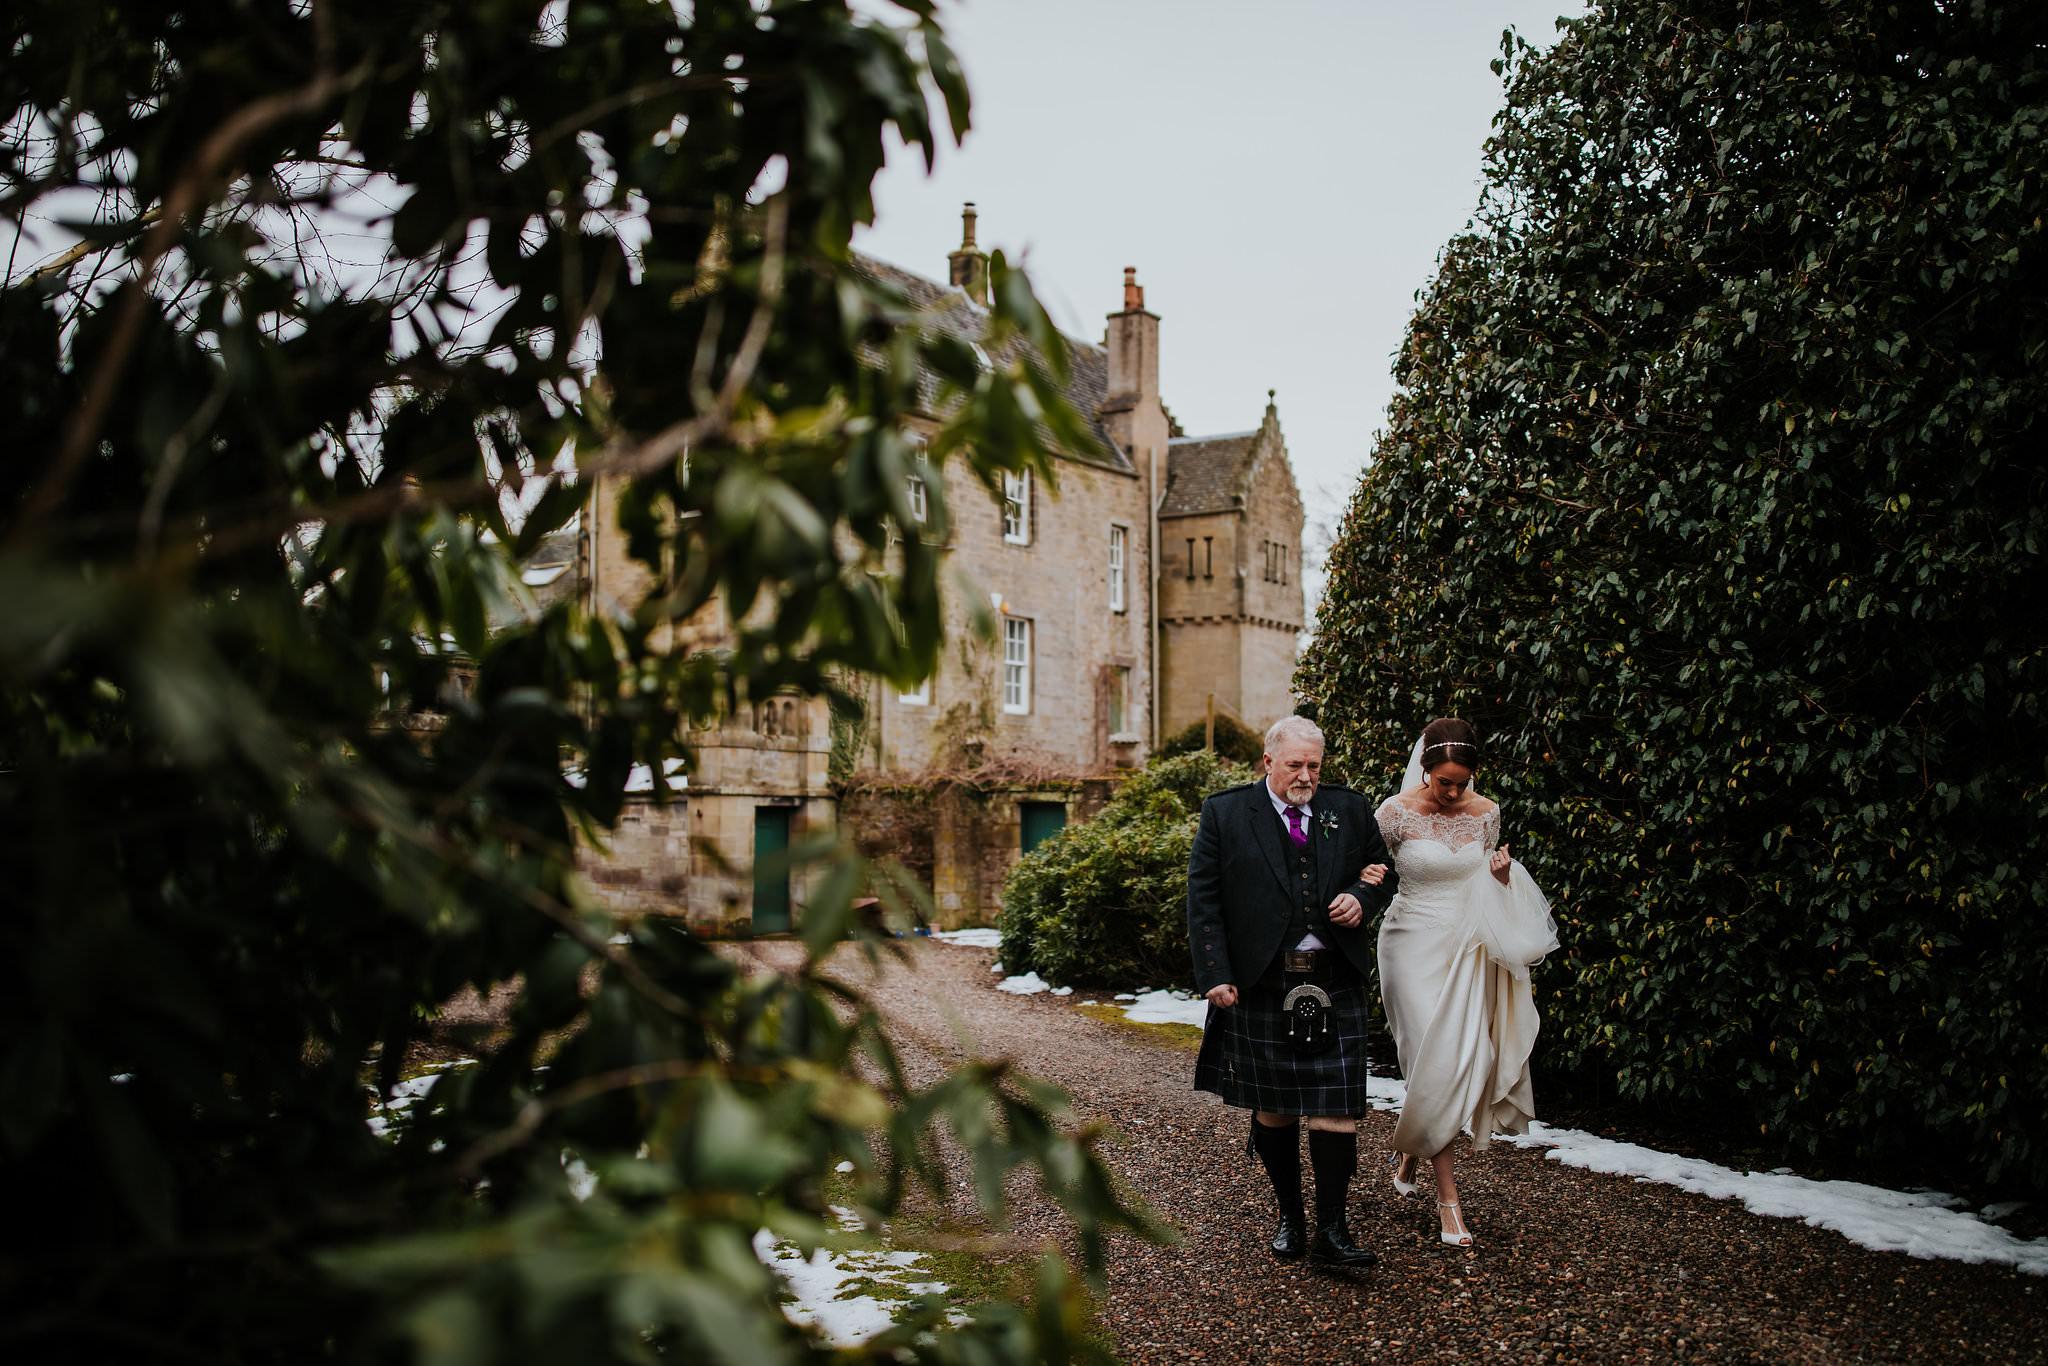 kirknewton stables wedding photographer (25).jpg